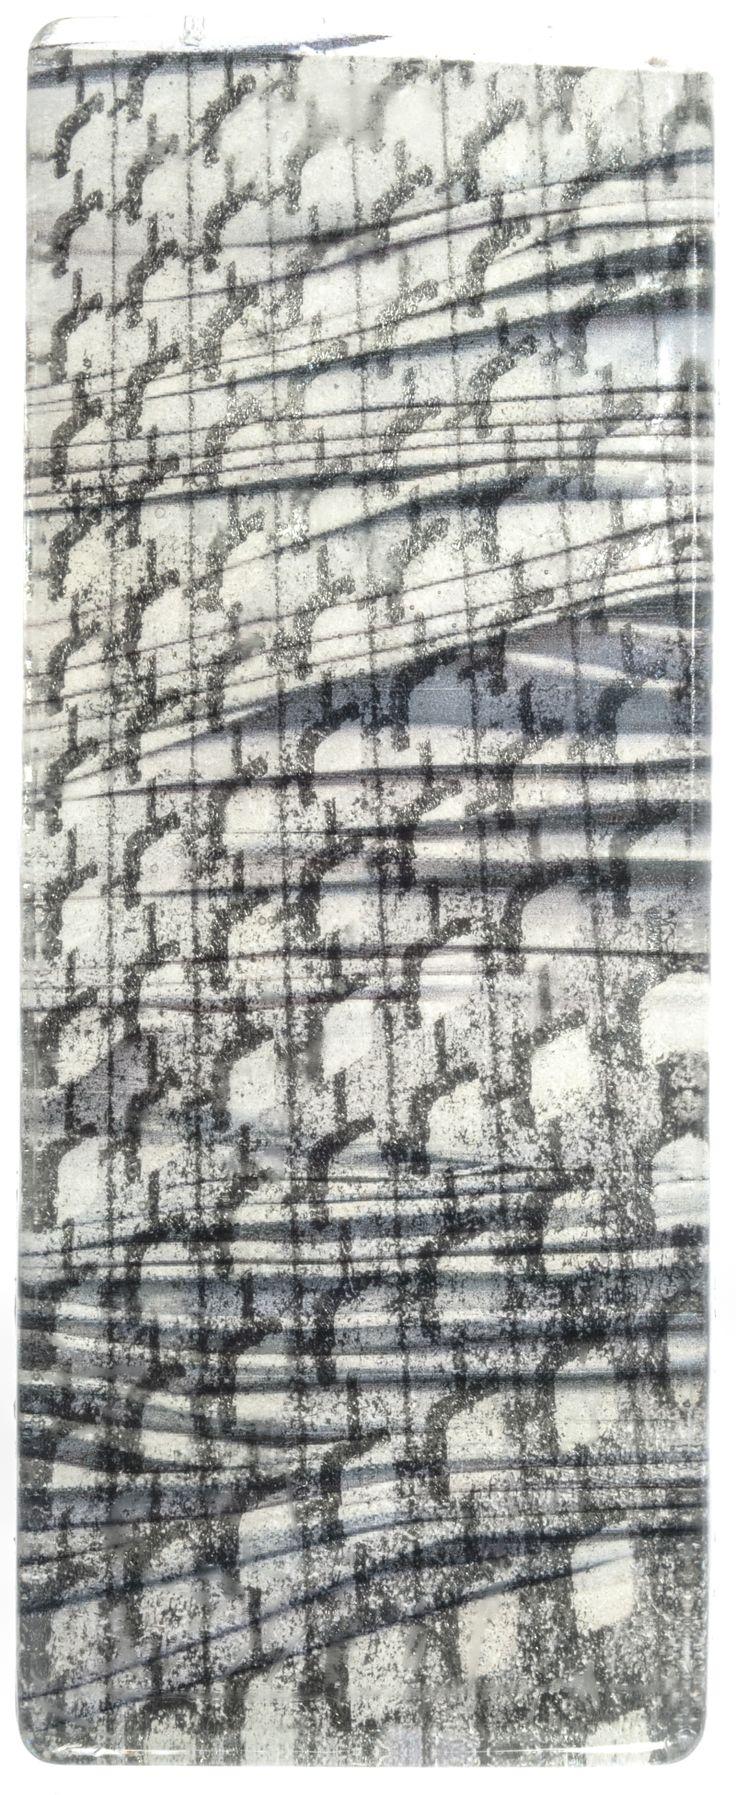 Superposition   Résine, papier, rodoïd  Armelle Balahy, Mathilde Coin, 2014